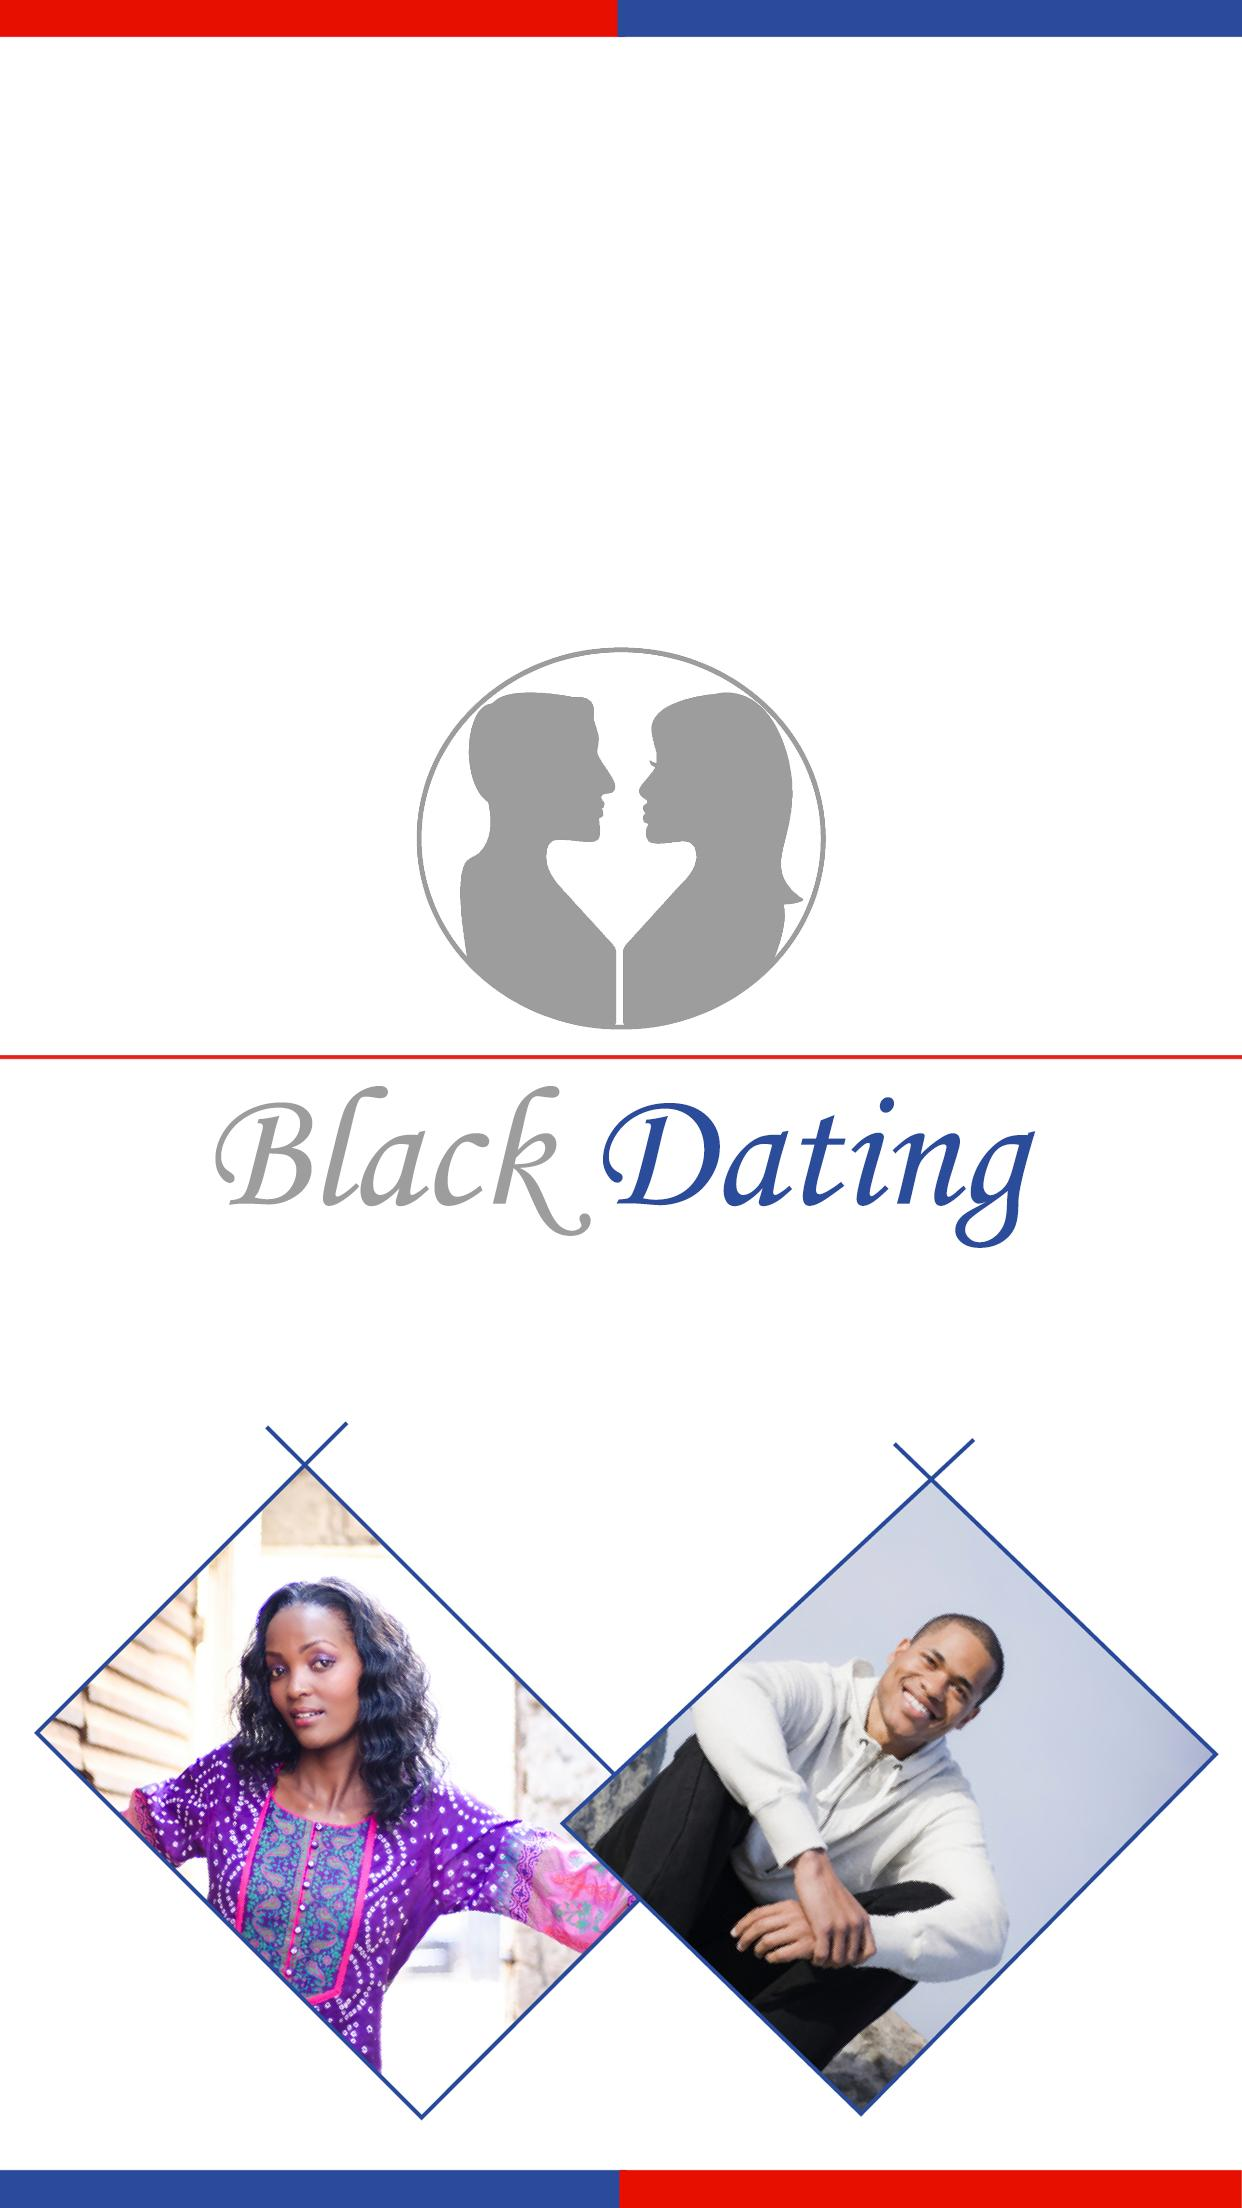 Login for free black dating colnaghi.co.uk